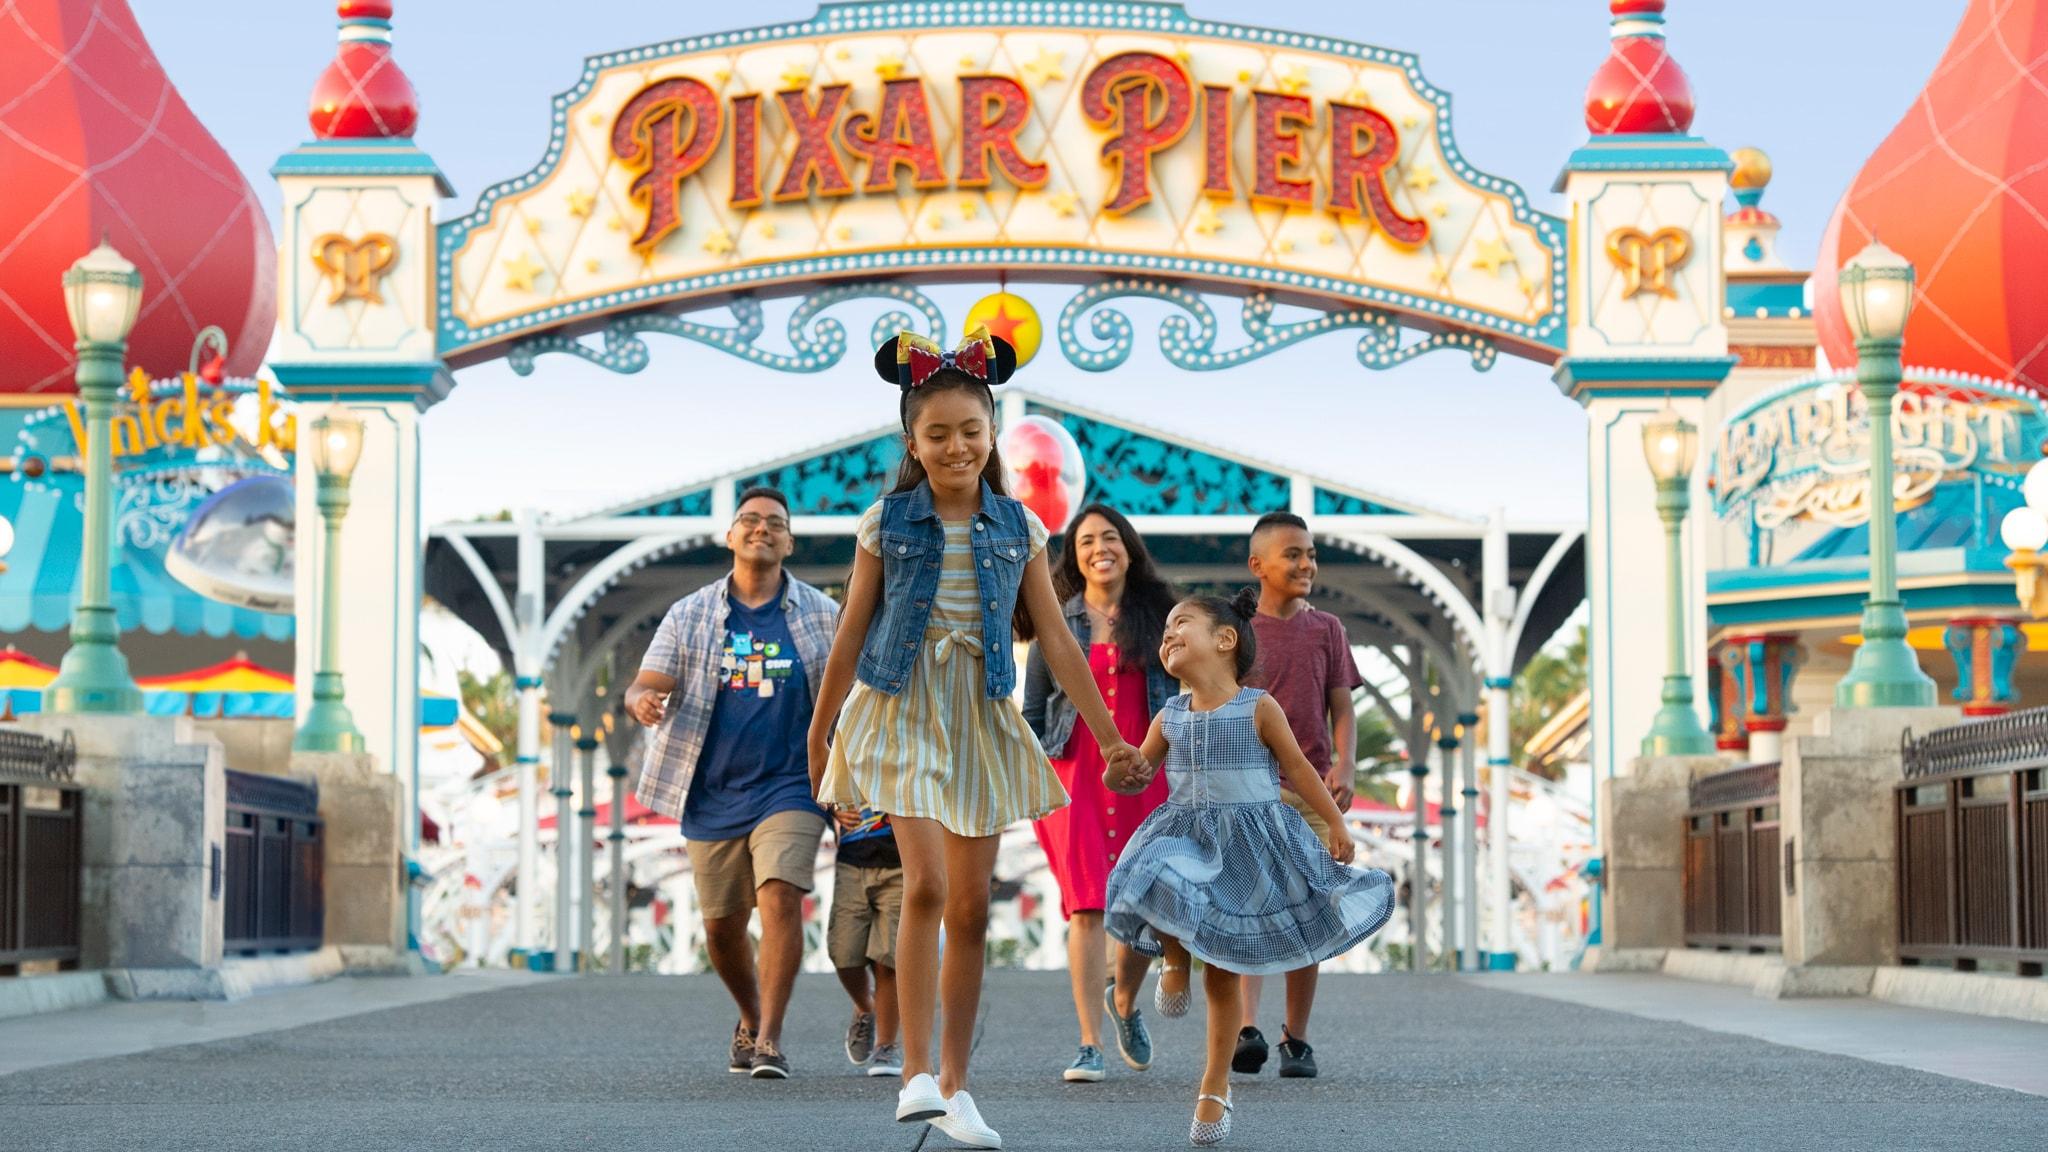 A family of six strolls under the Pixar Pier archway at Disney California Adventure Park